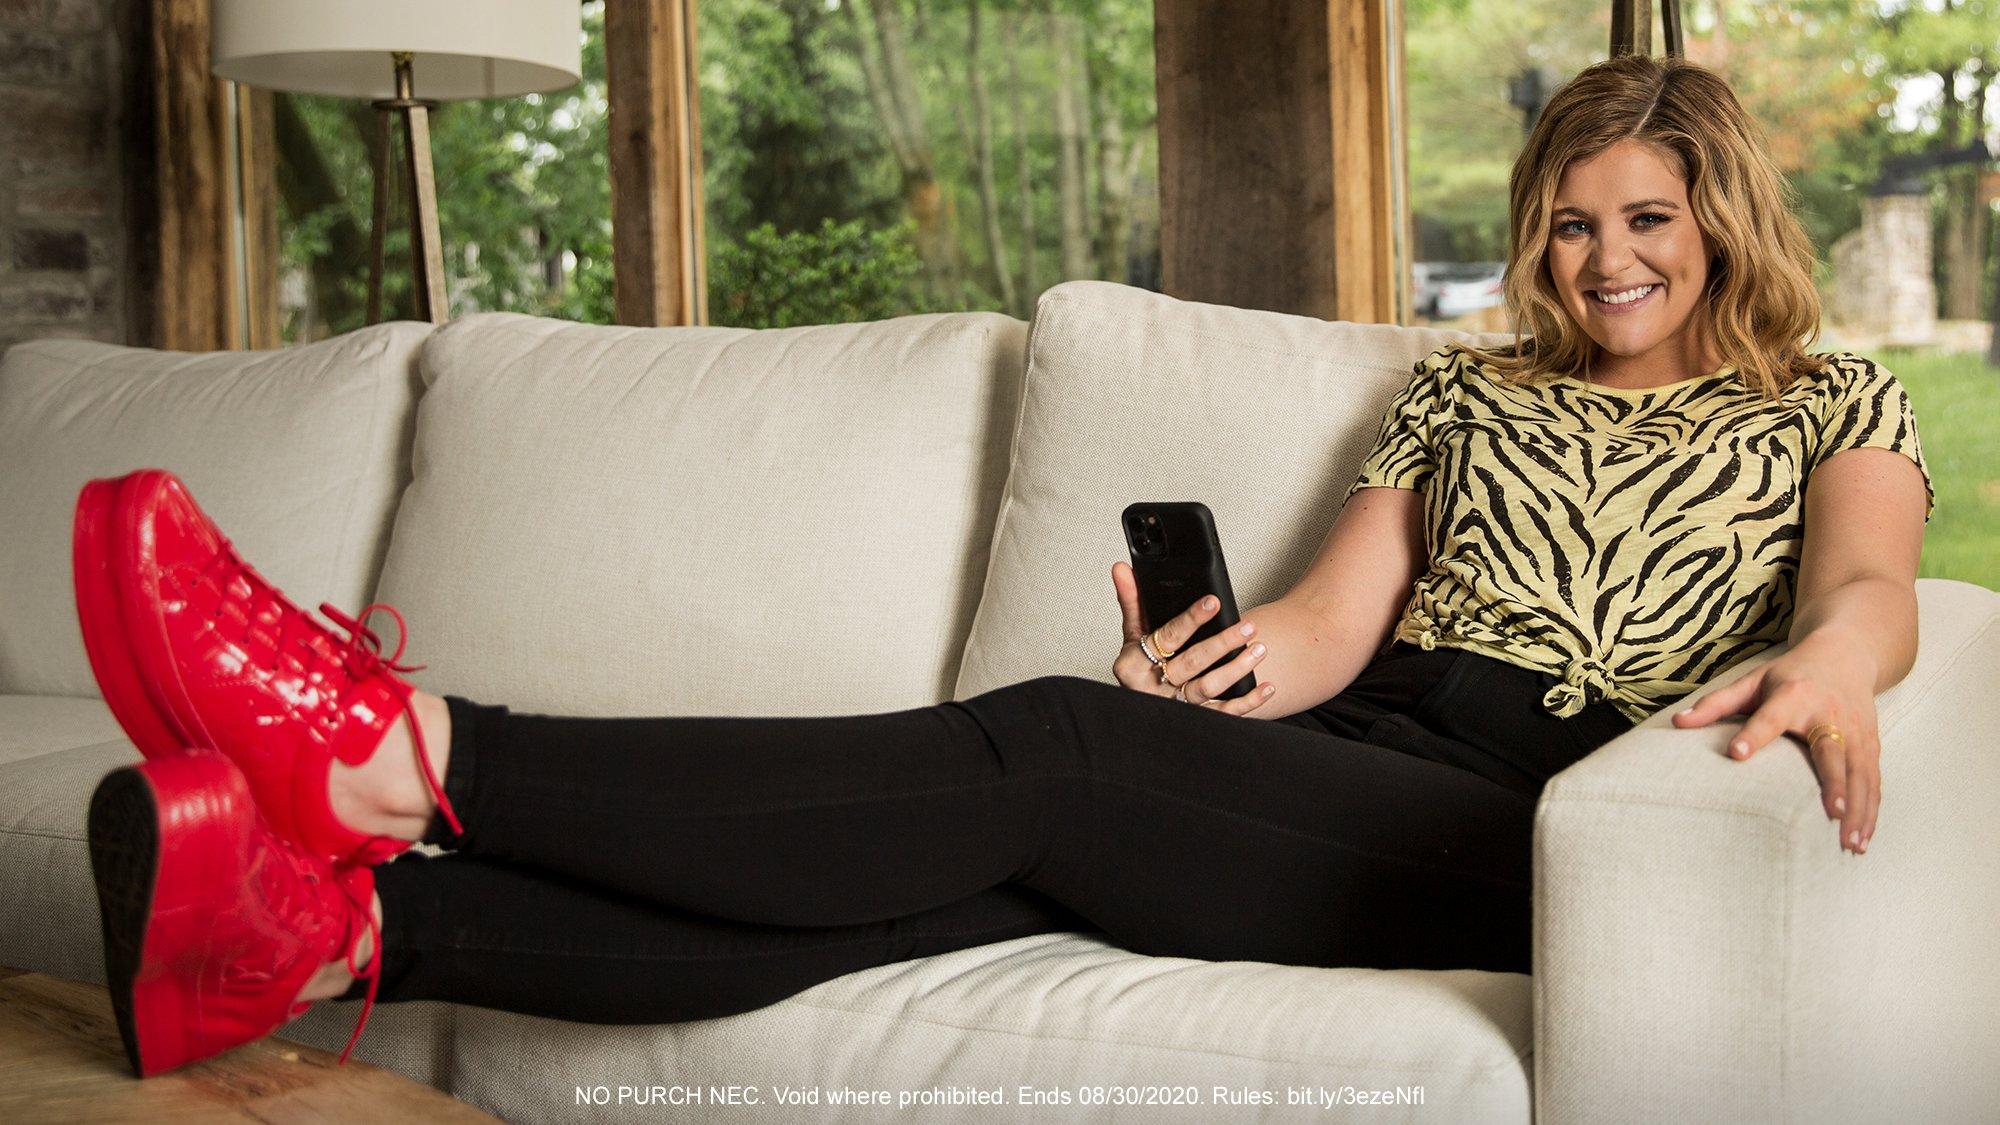 U.S. Cellular Partners with Lauren Alaina